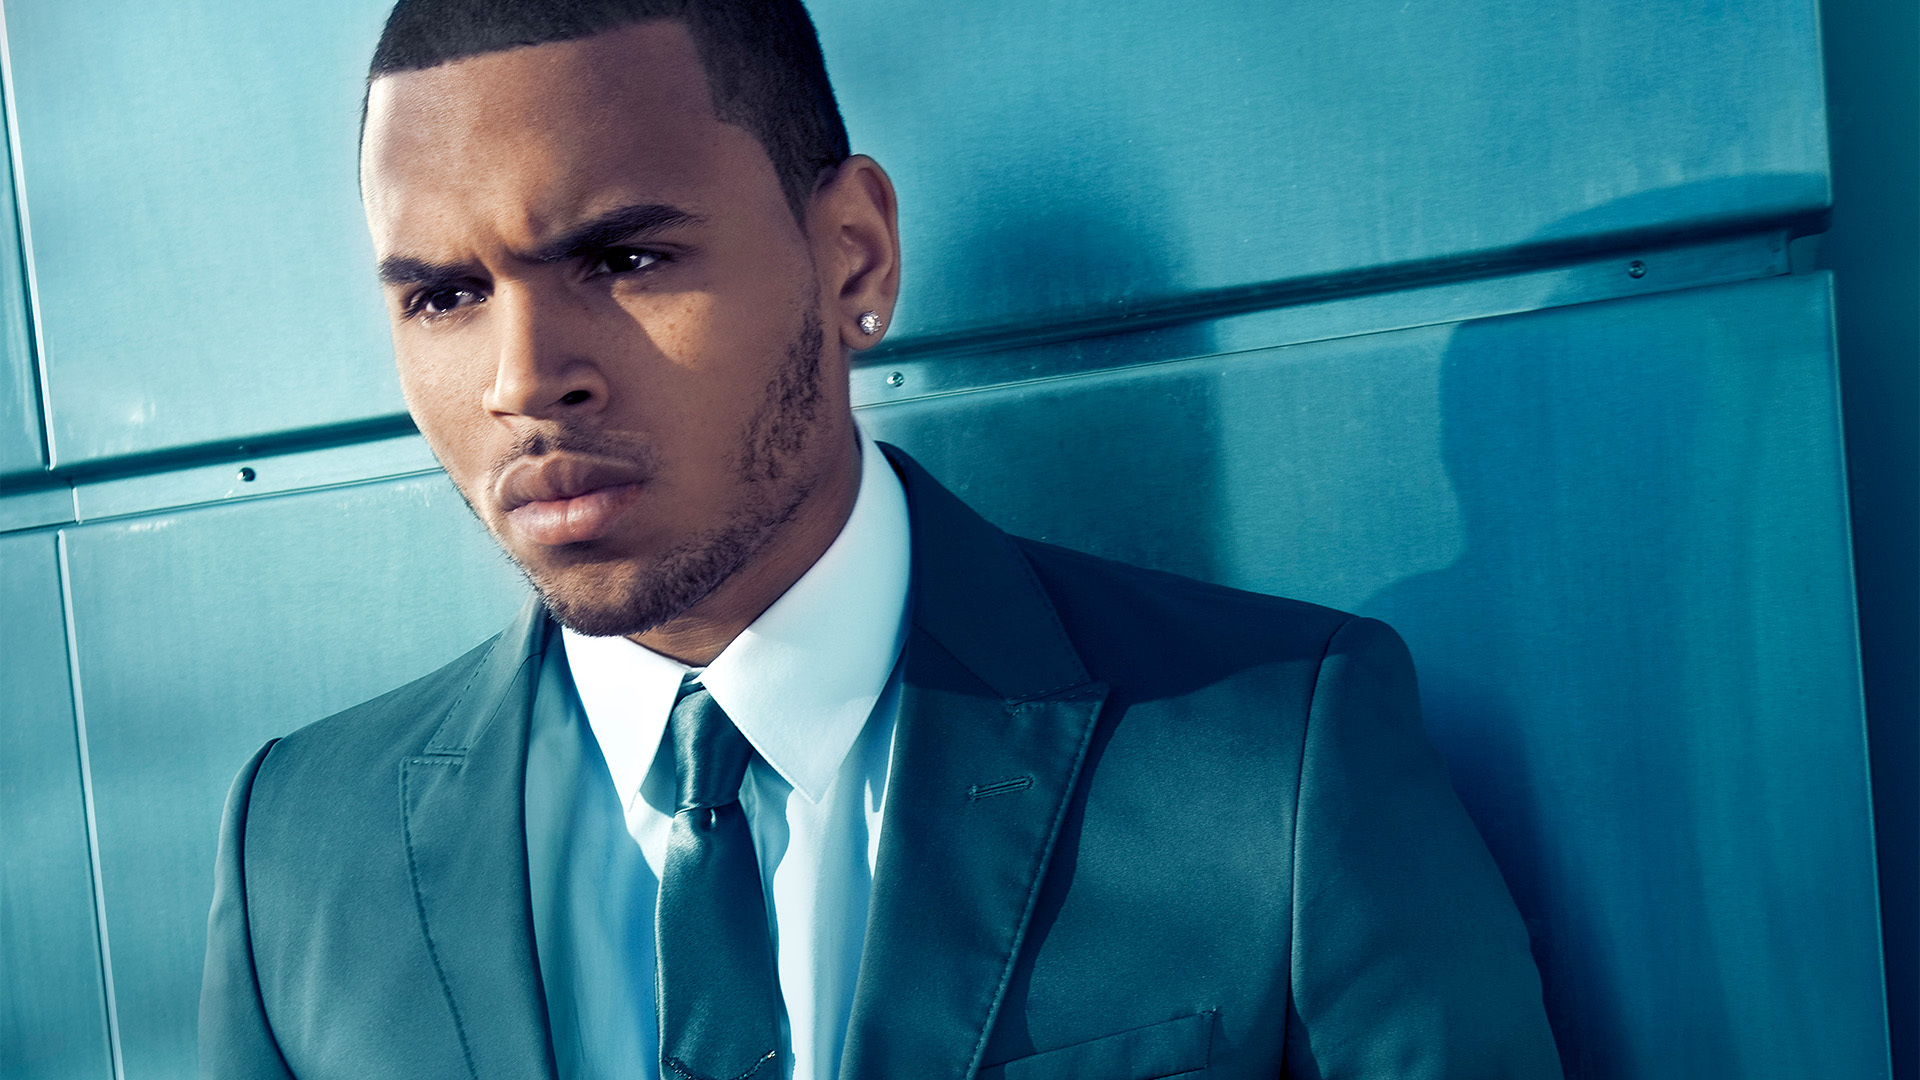 Chris Brown Wallpapers Hq